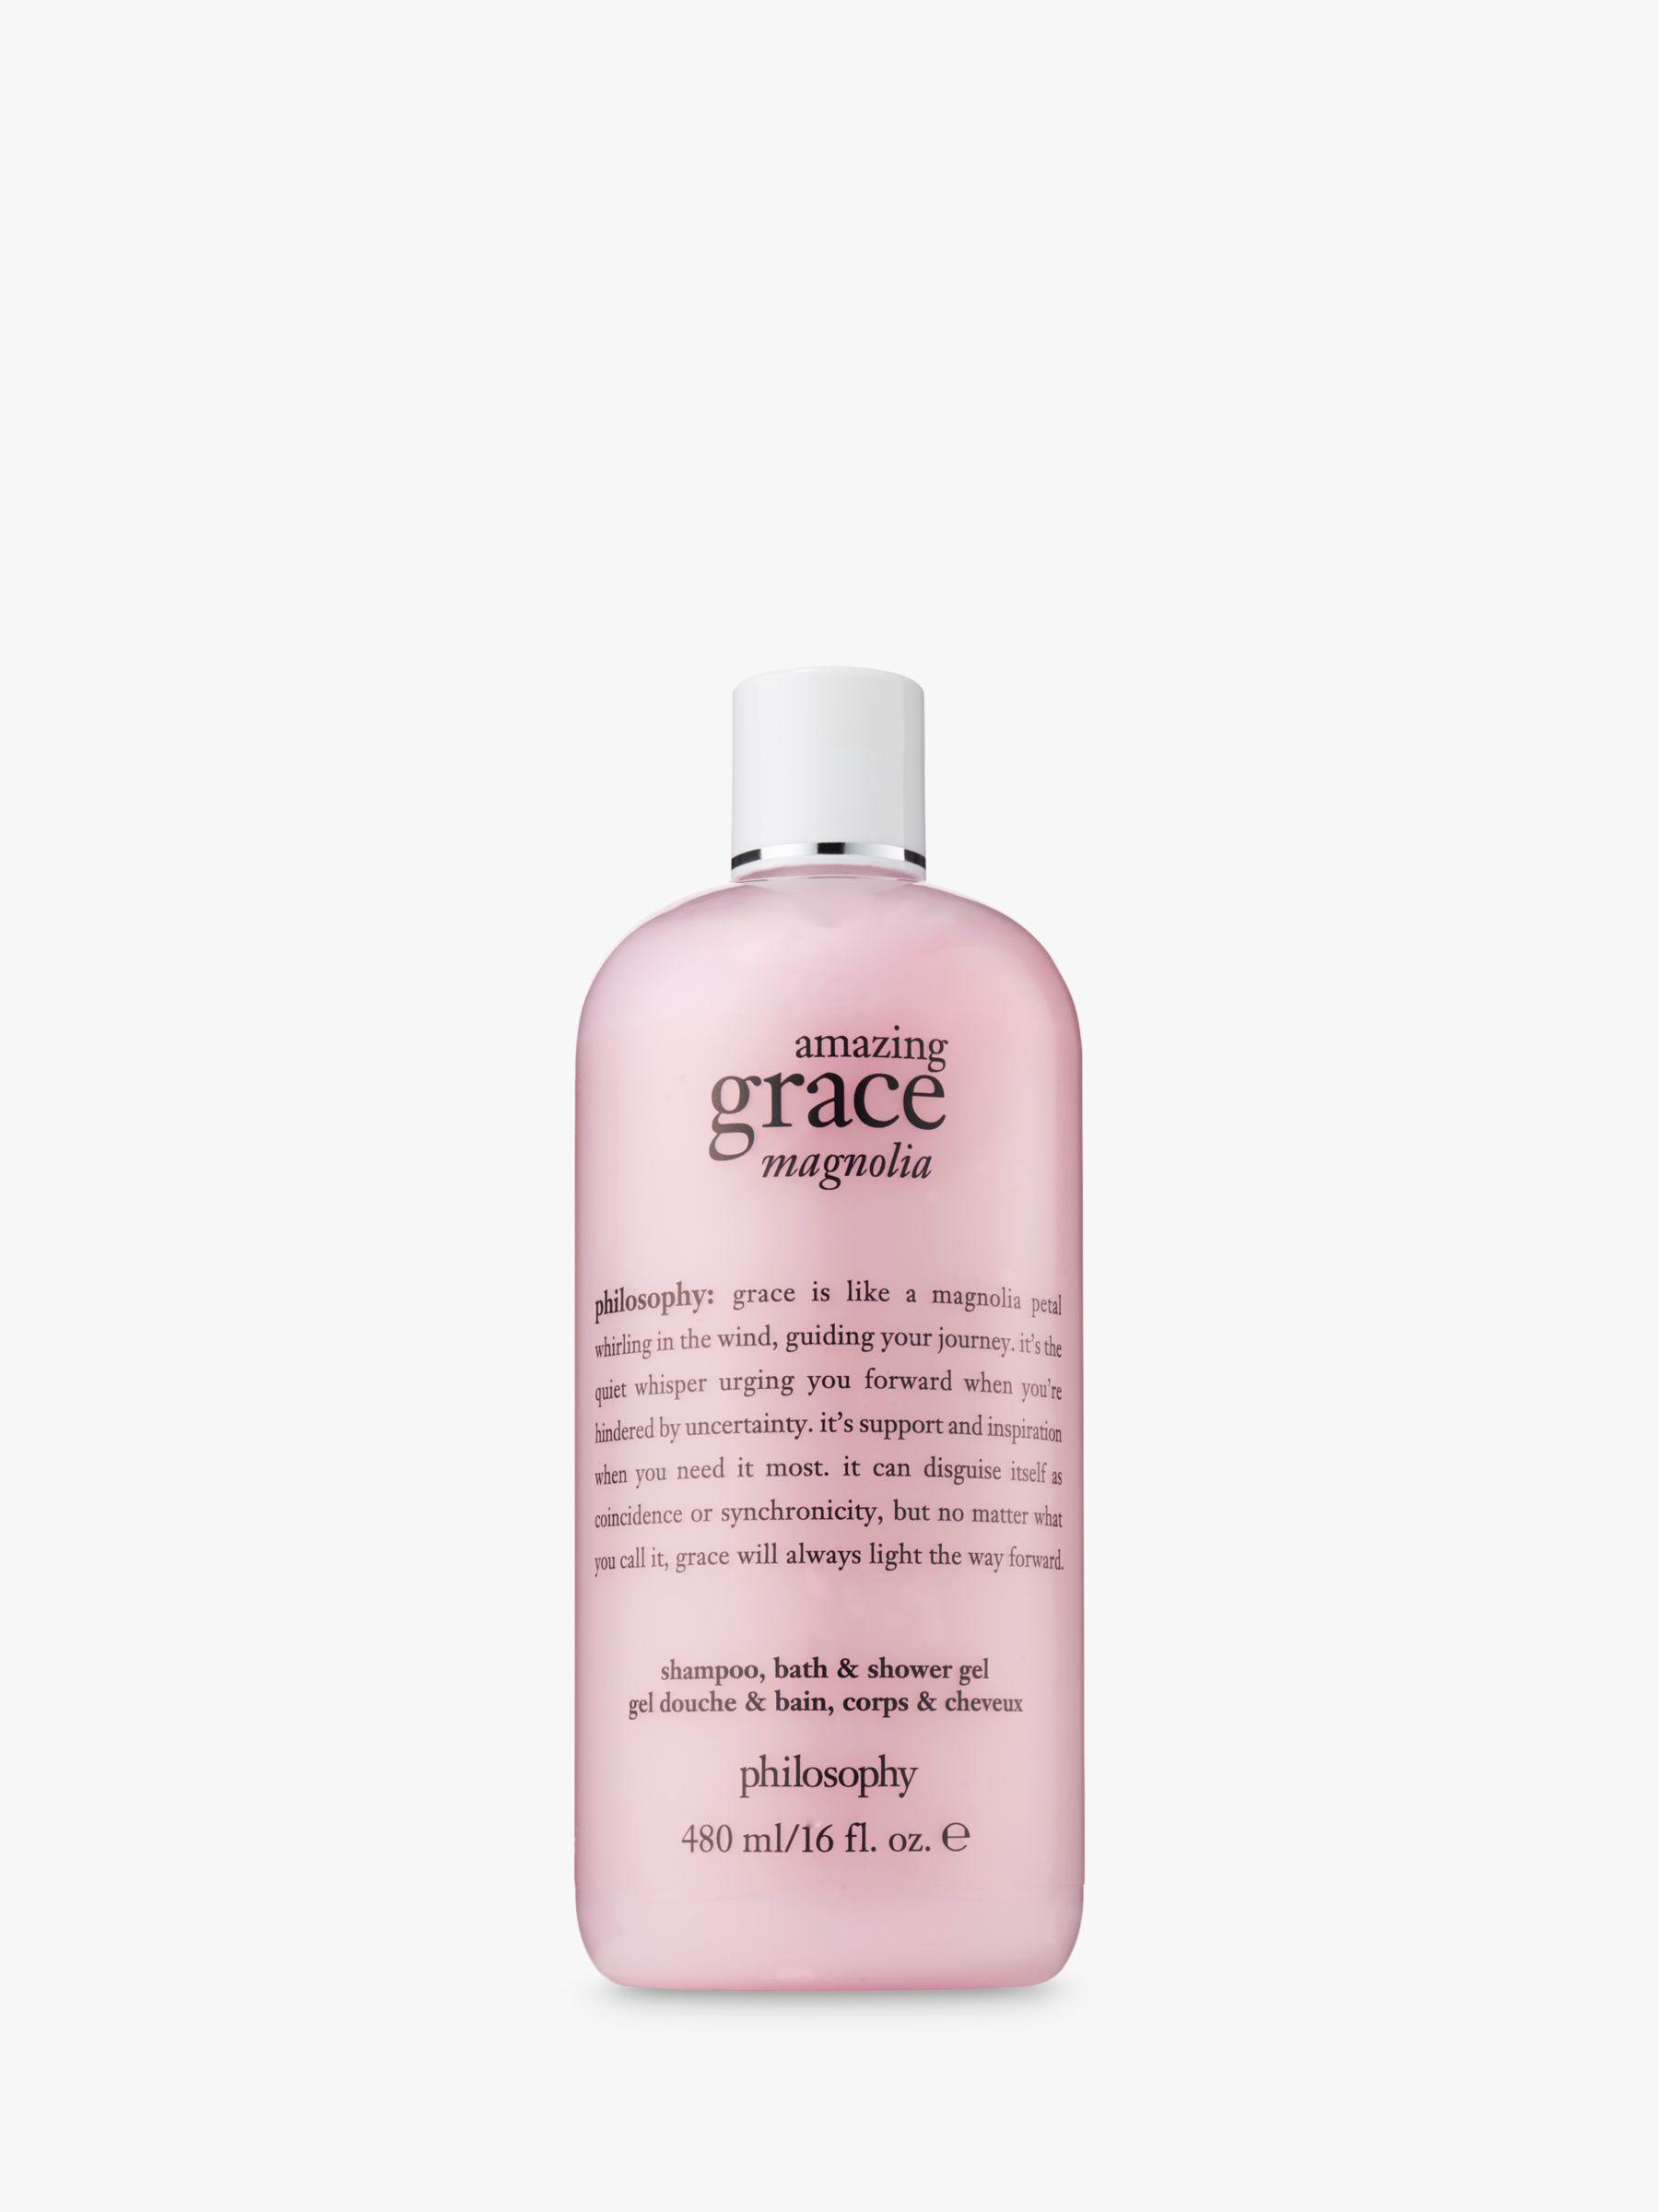 Philosophy Philosophy Amazing Grace Magnolia Shampoo, Bath & Shower Gel, 480ml